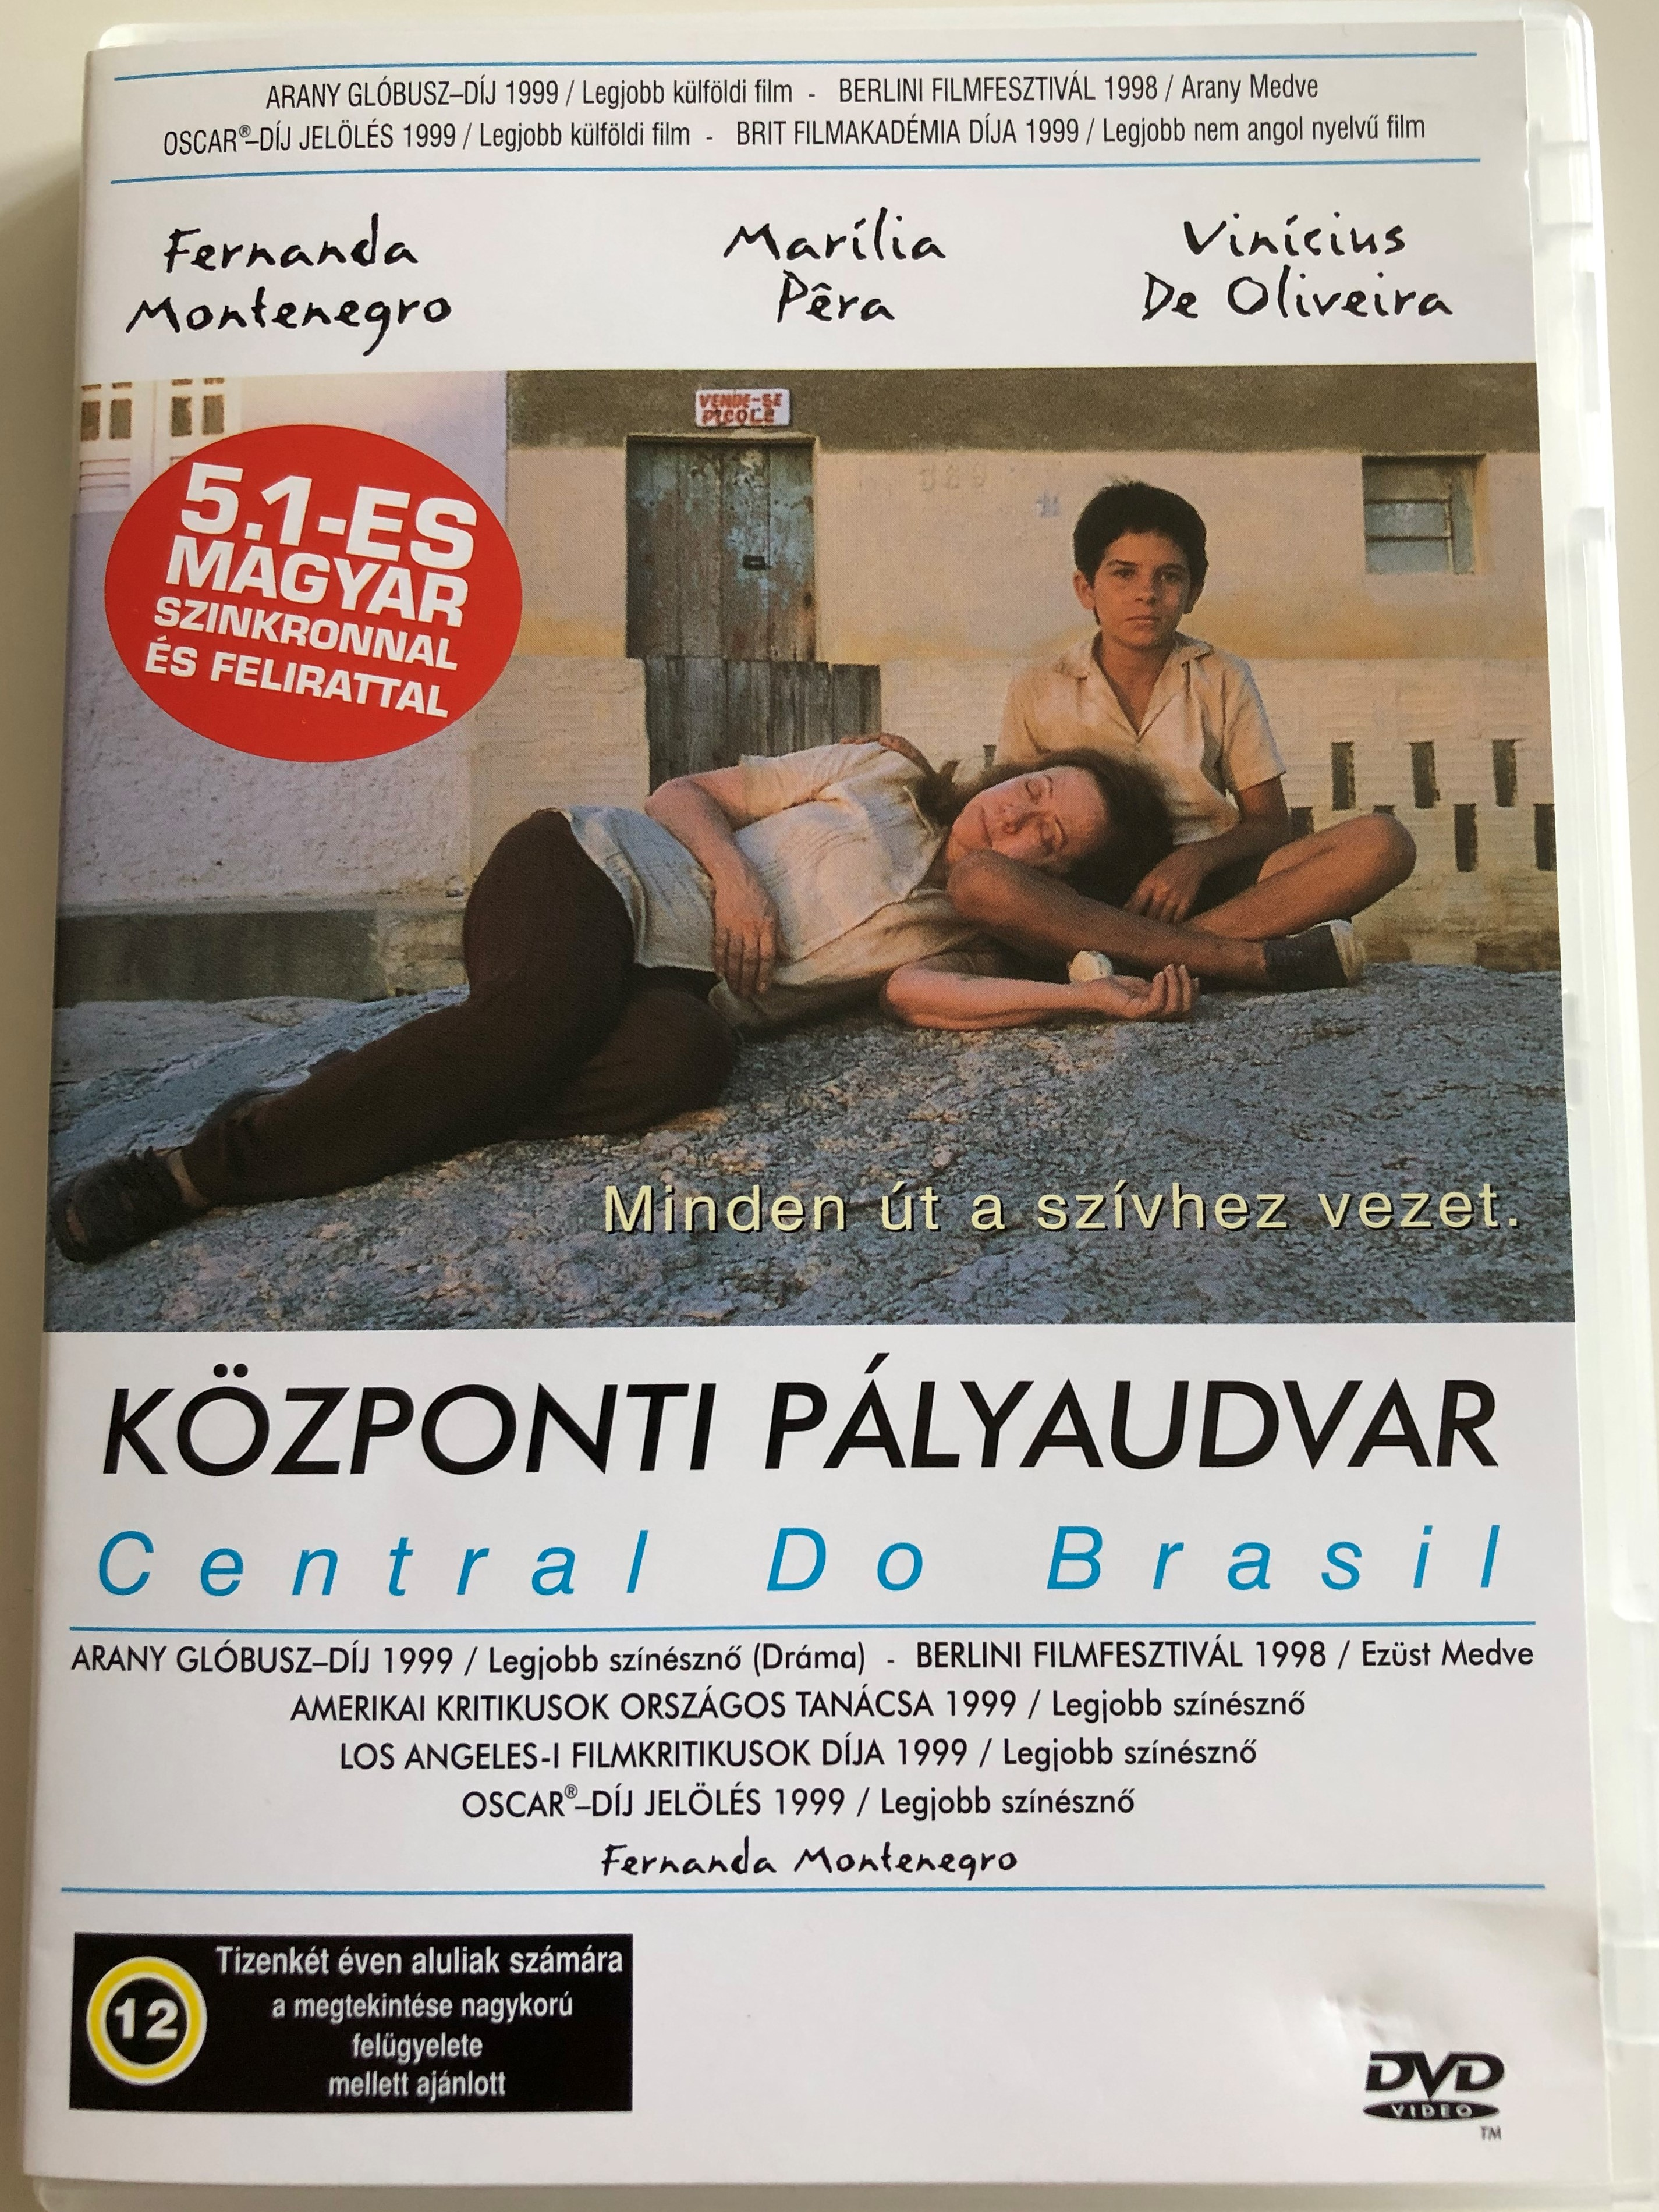 central-do-brasil-dvd-1998-k-zponti-p-lyaudvar-central-station-directed-by-walter-salles-starring-fernanda-montenegro-vin-cius-de-oliveira-mar-lia-p-ra-1-.jpg